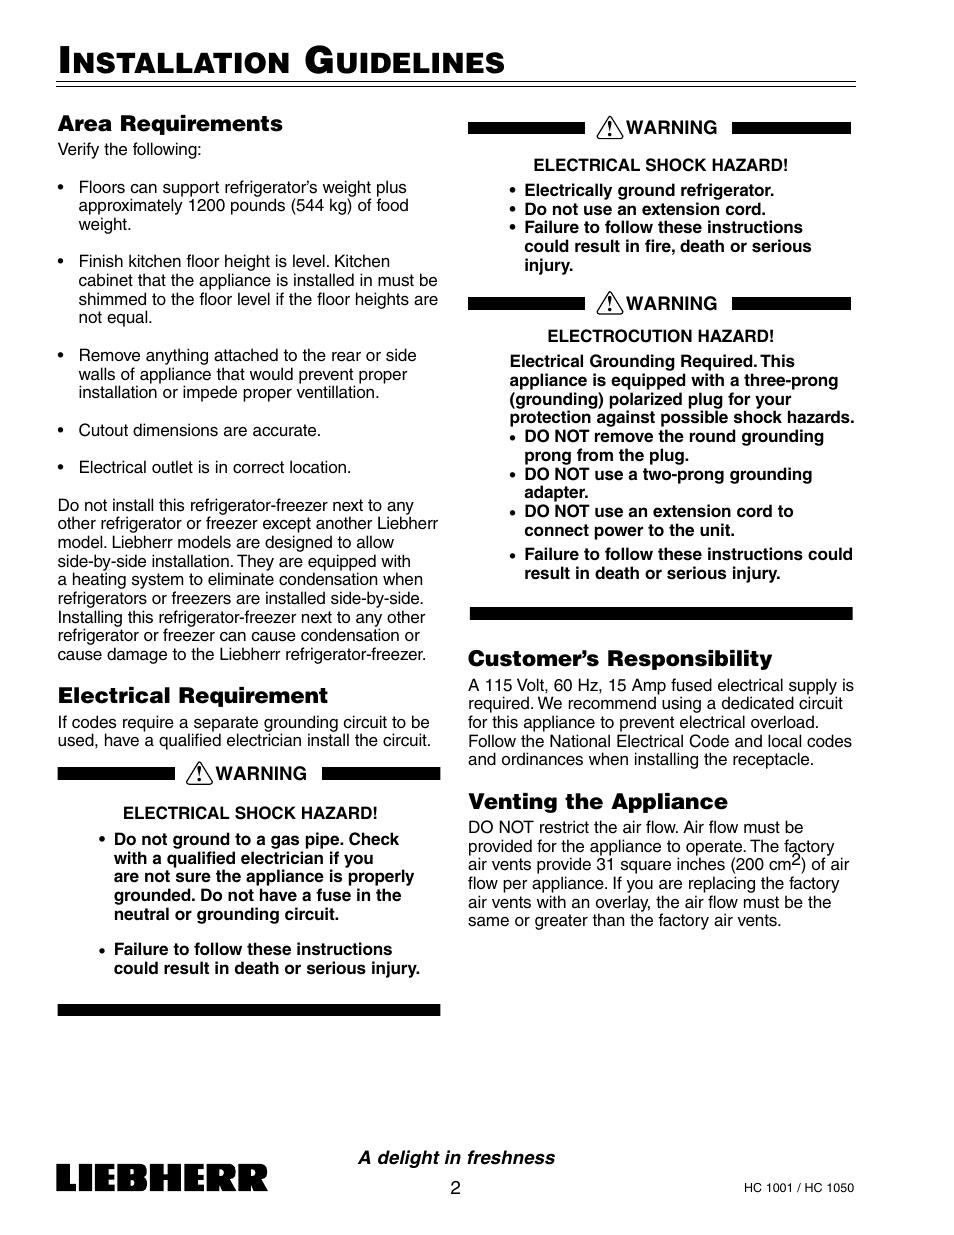 Nstallation, Uidelines | Liebherr HC1050 User Manual | Page